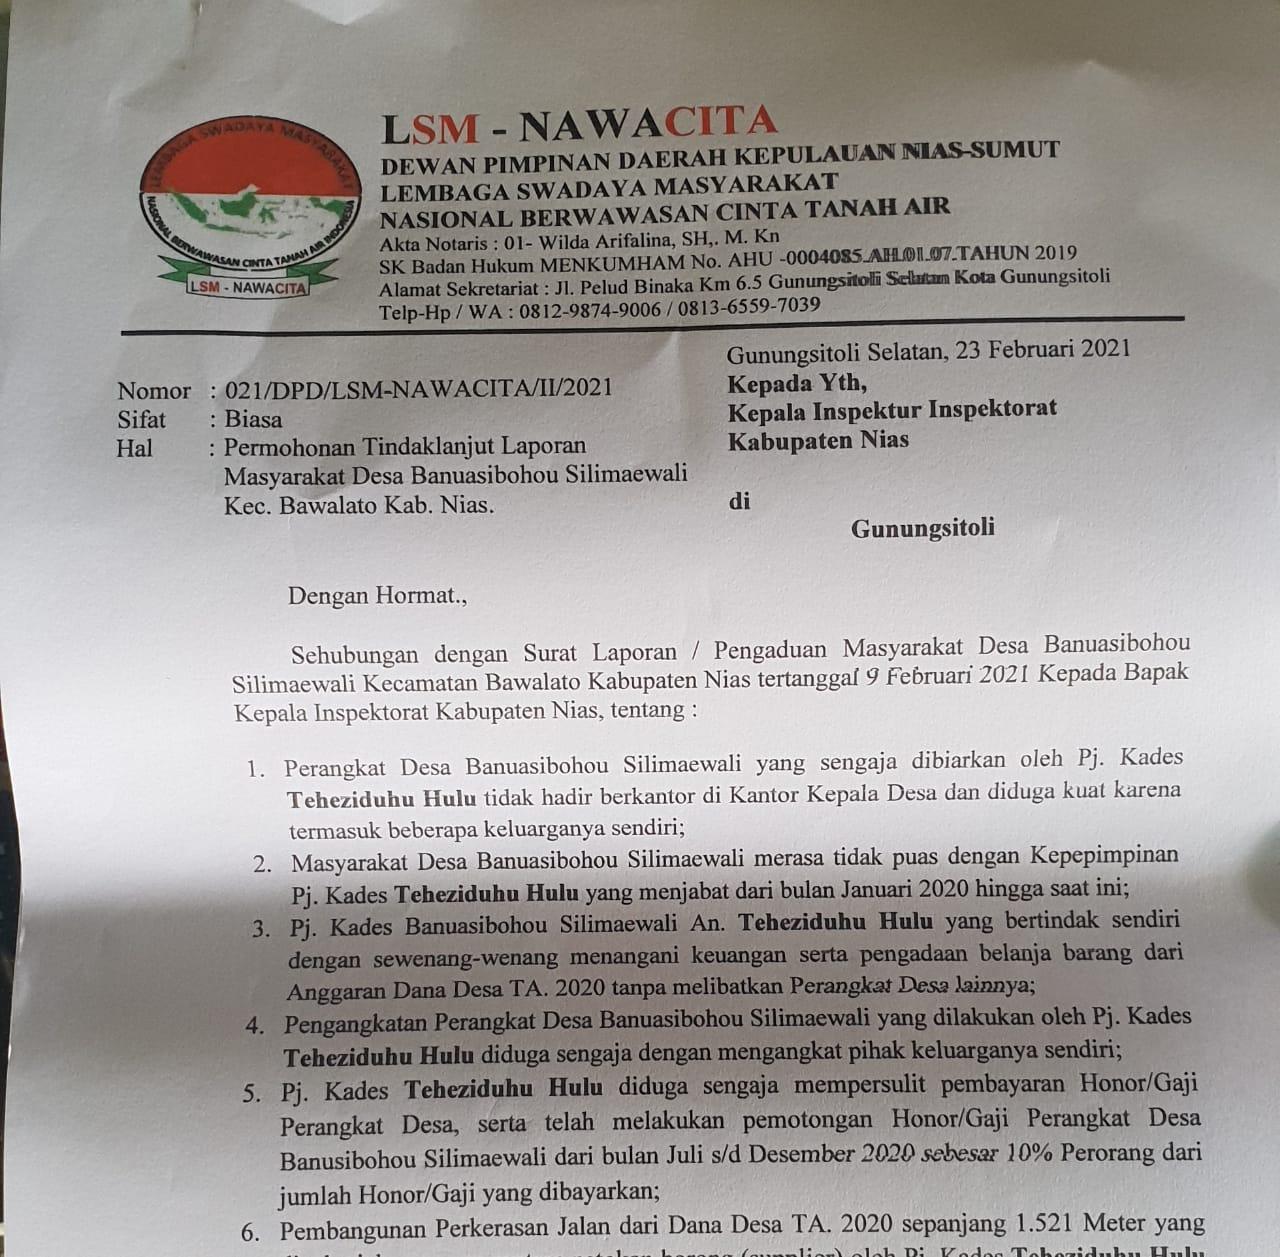 DPD LSM-NAWACITA Kepulauan Nias-Sumut Menyurati Inspektorat Kabupaten Nias